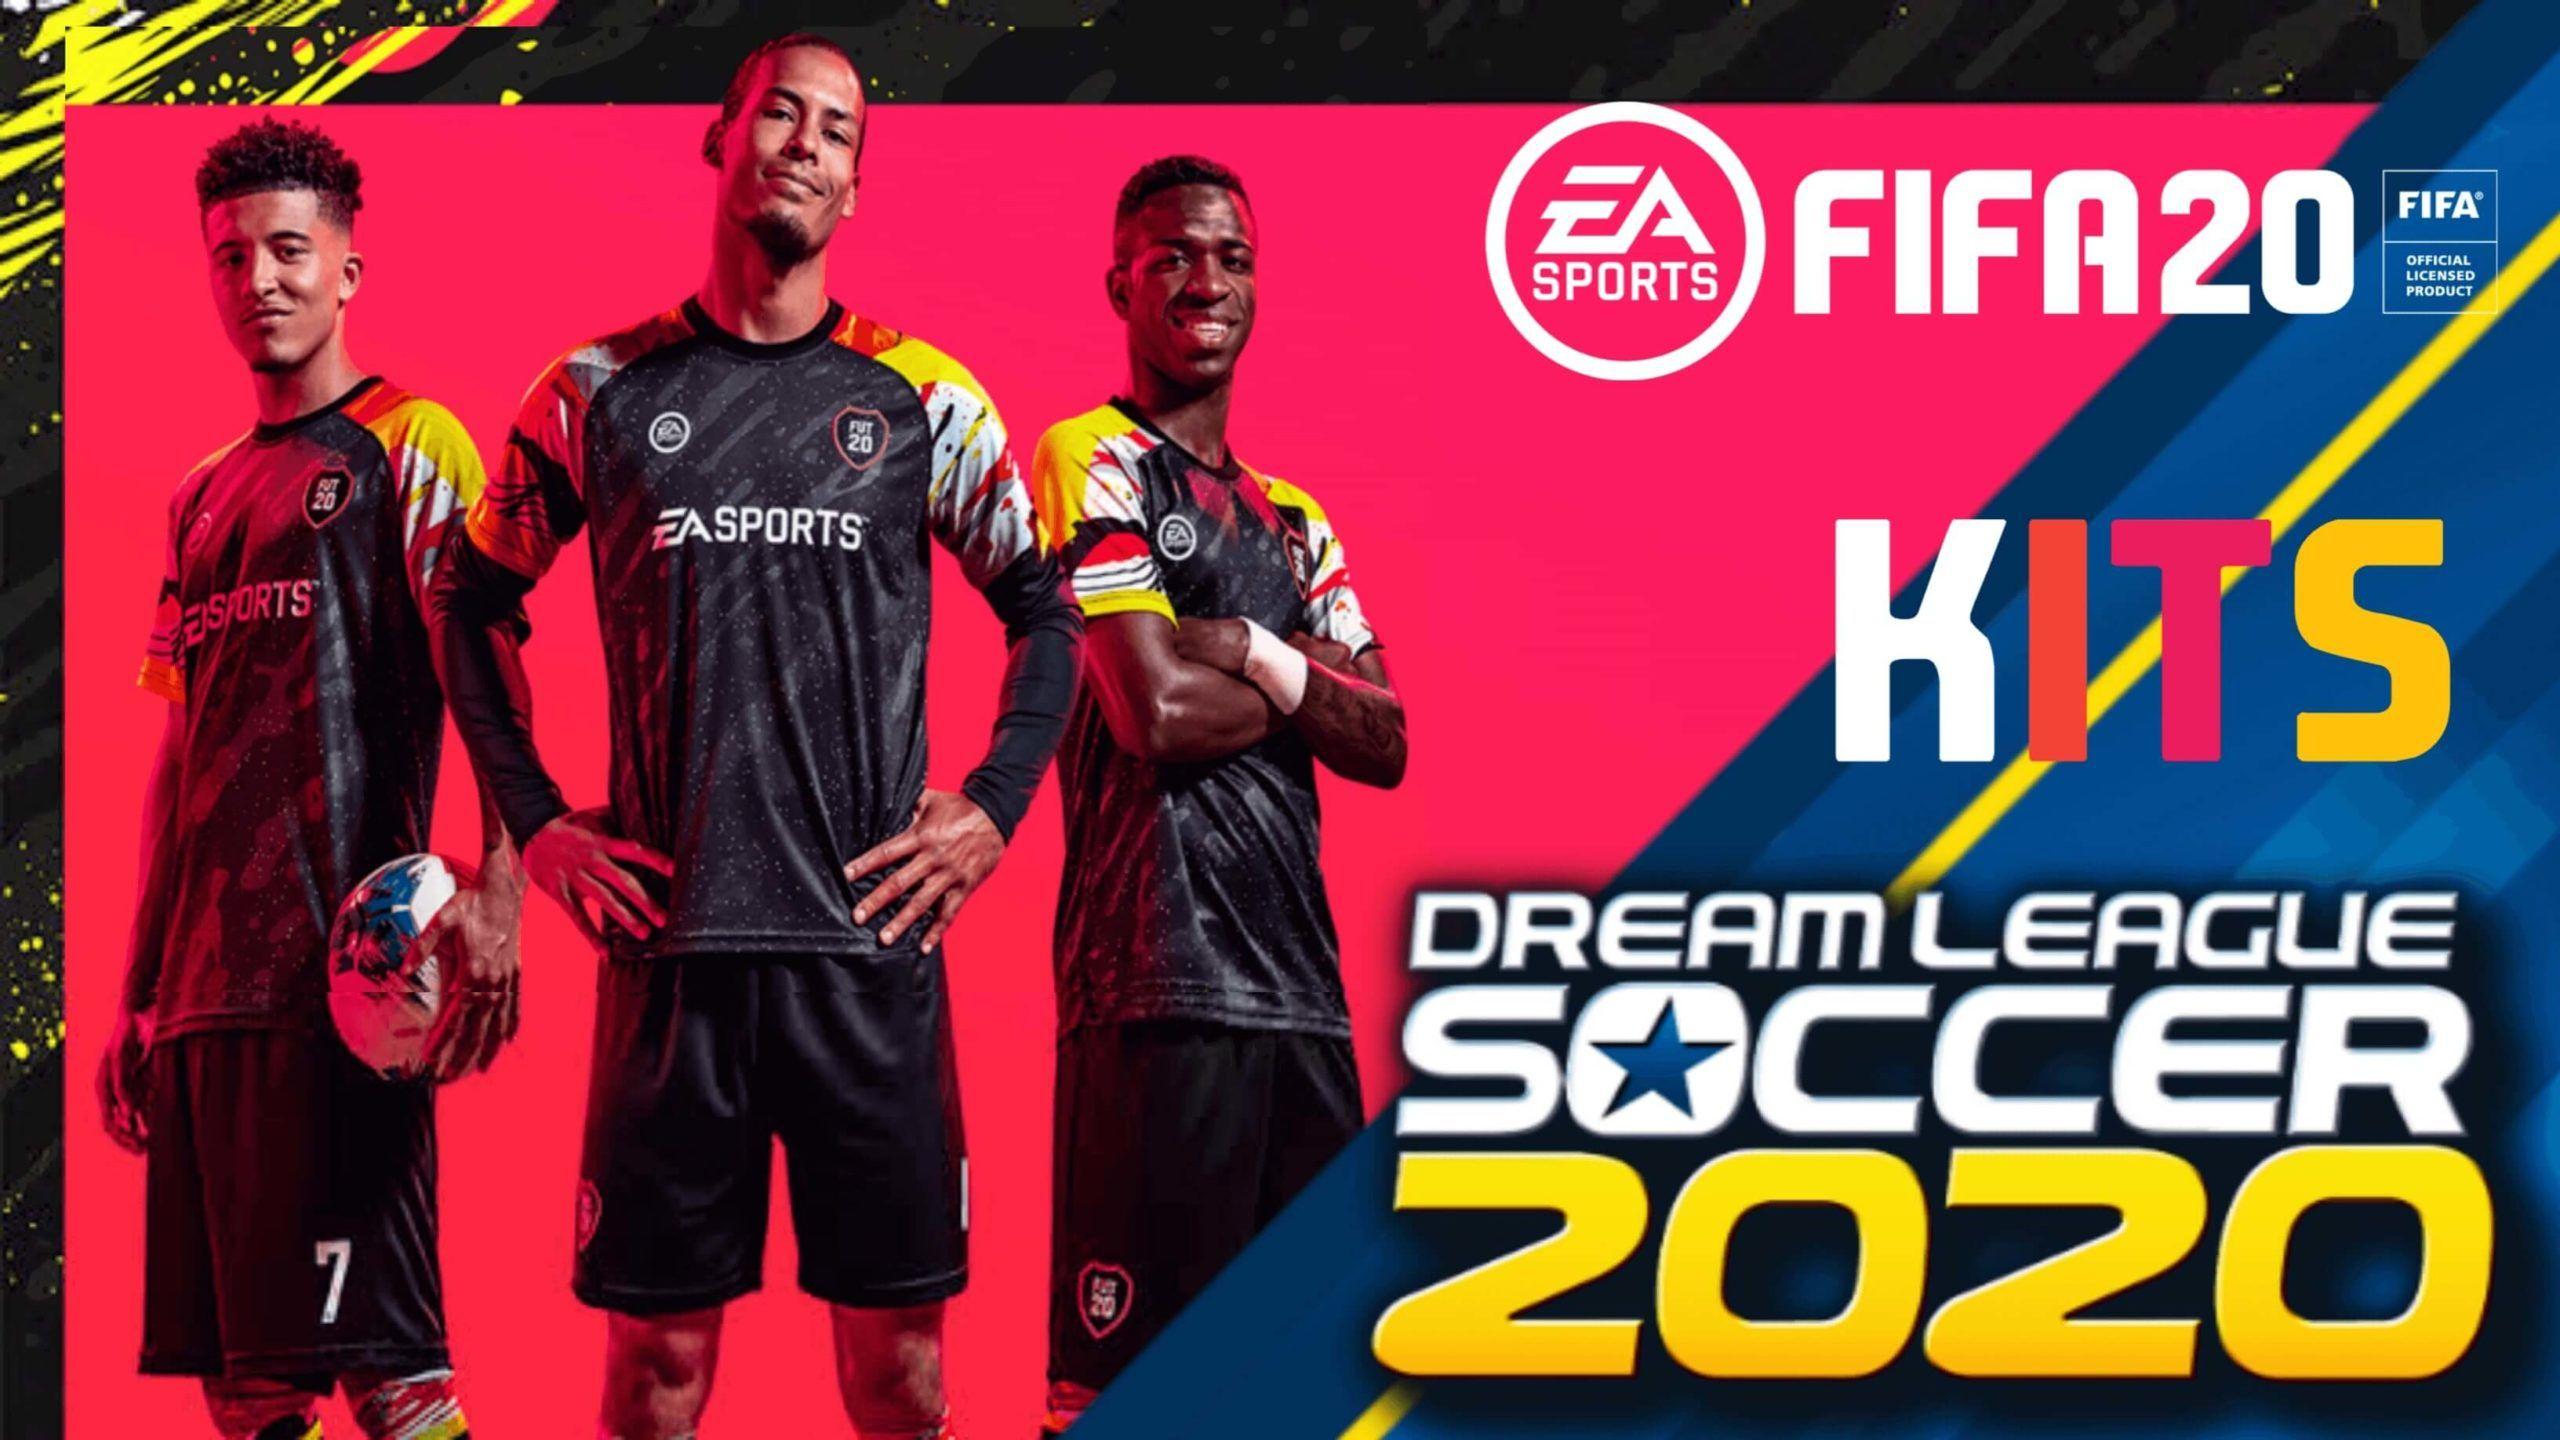 Fut 20 Kits For Dls 20 Dream League Soccer In 2020 League Soccer Fifa Fifa Ultimate Team